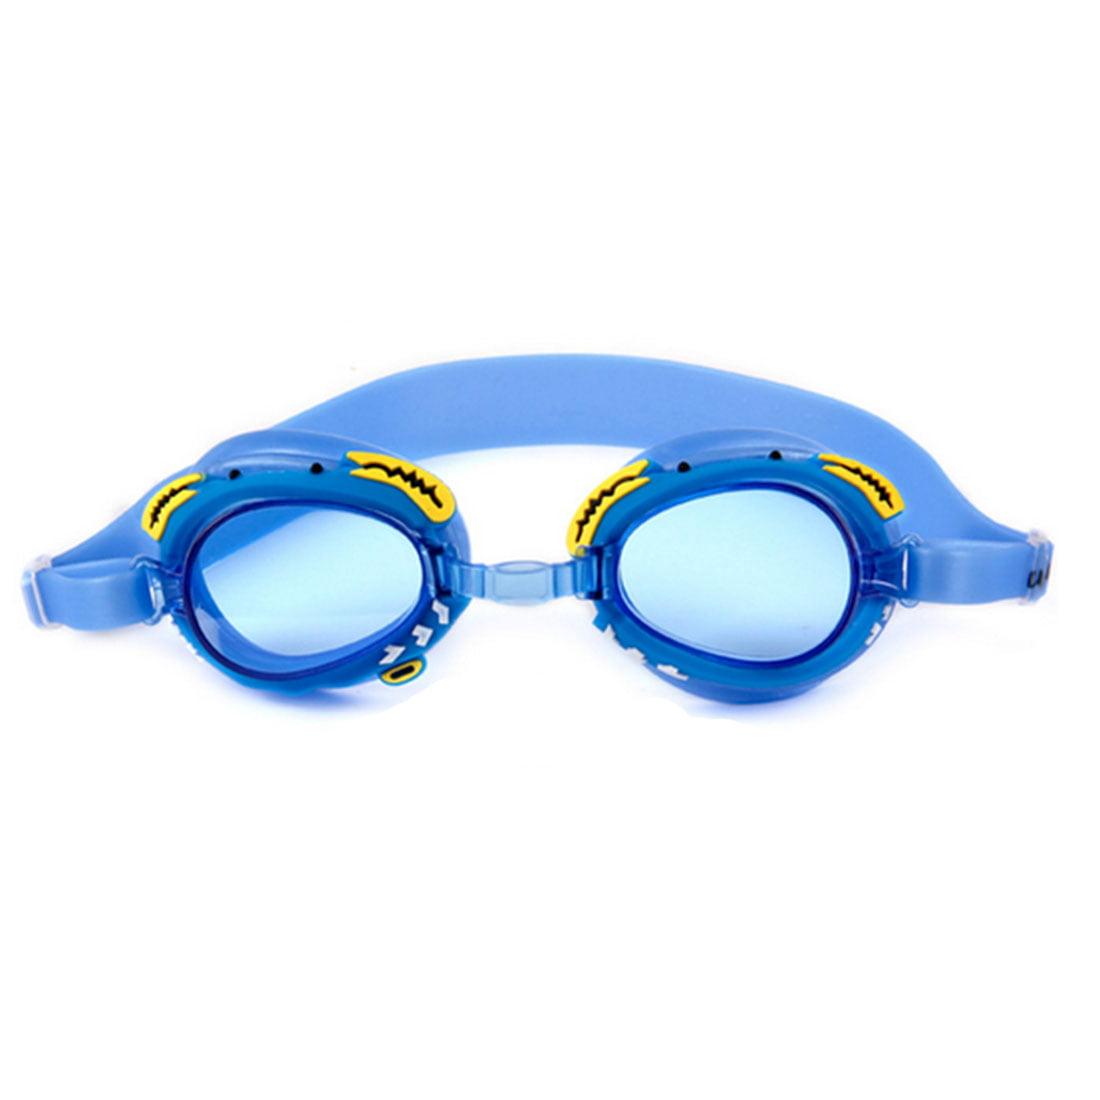 Waterproof Antifog Children Swimming Goggles Flat Glasses Blue Crab Type by